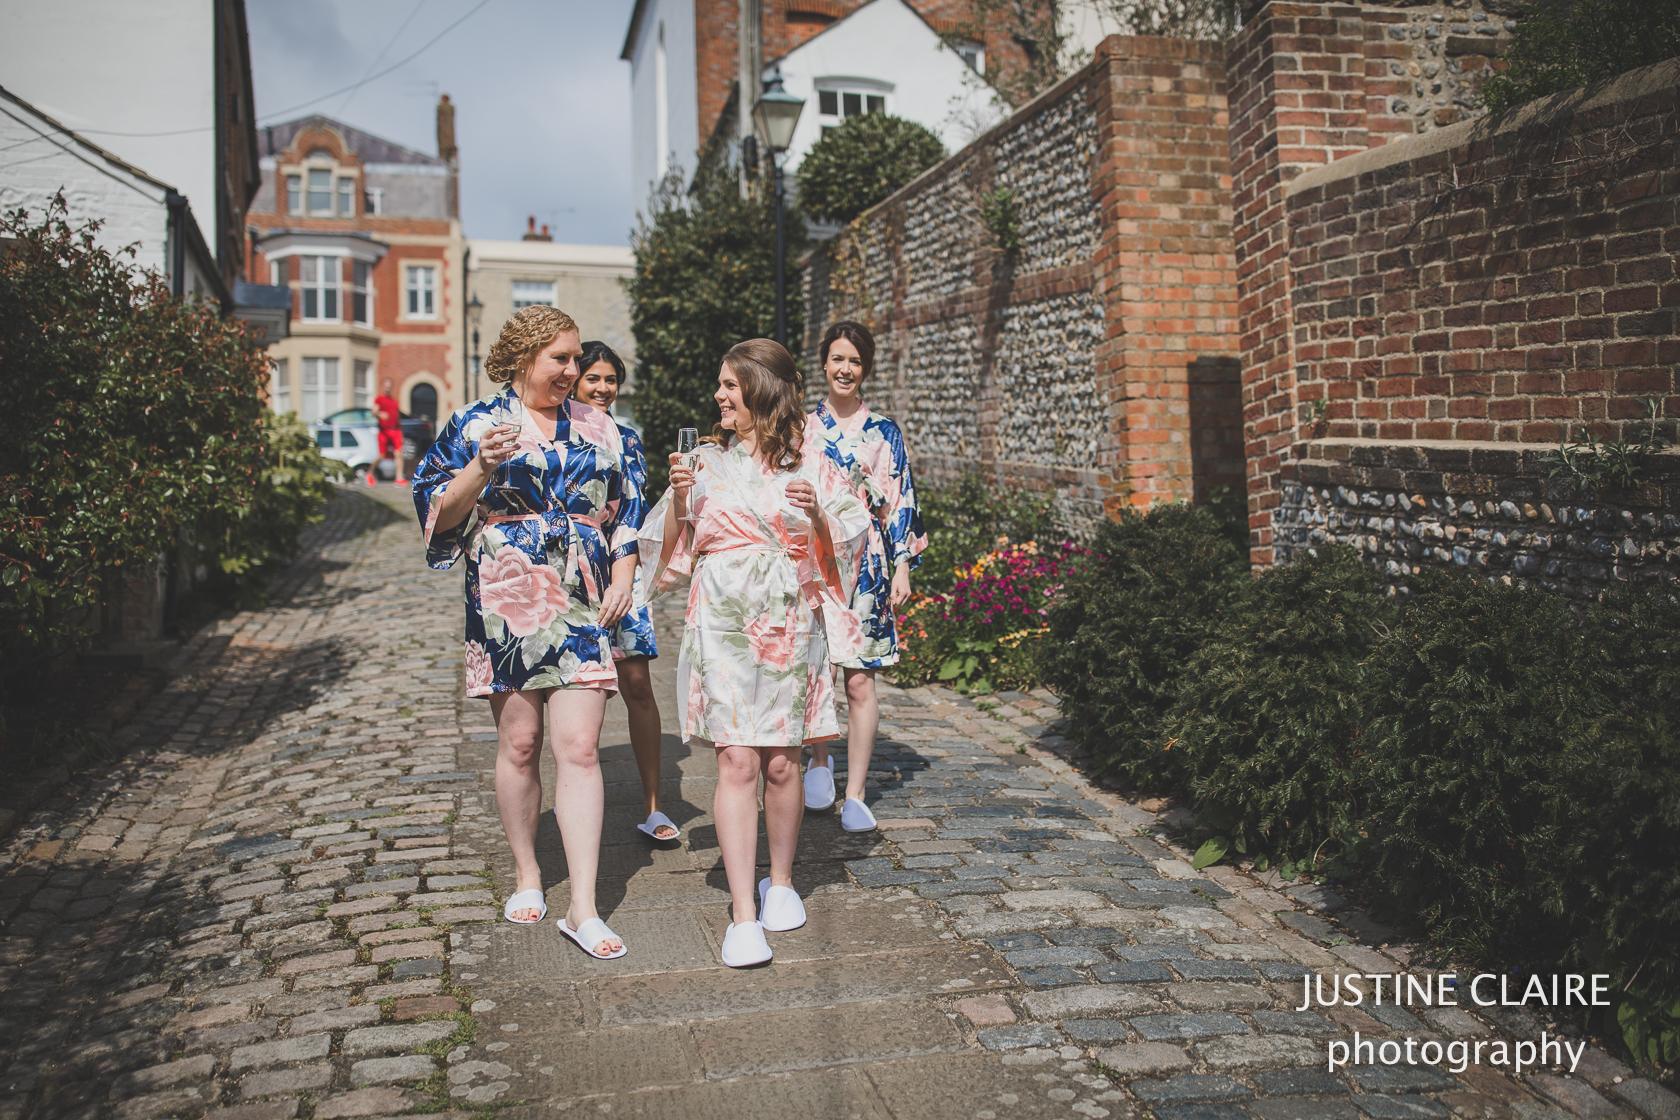 Fitzleroi Fittleworth petworth Billingshurst farm Wedding Photography by Justine Claire photographer Arundel Worthing Brighton-6.jpg